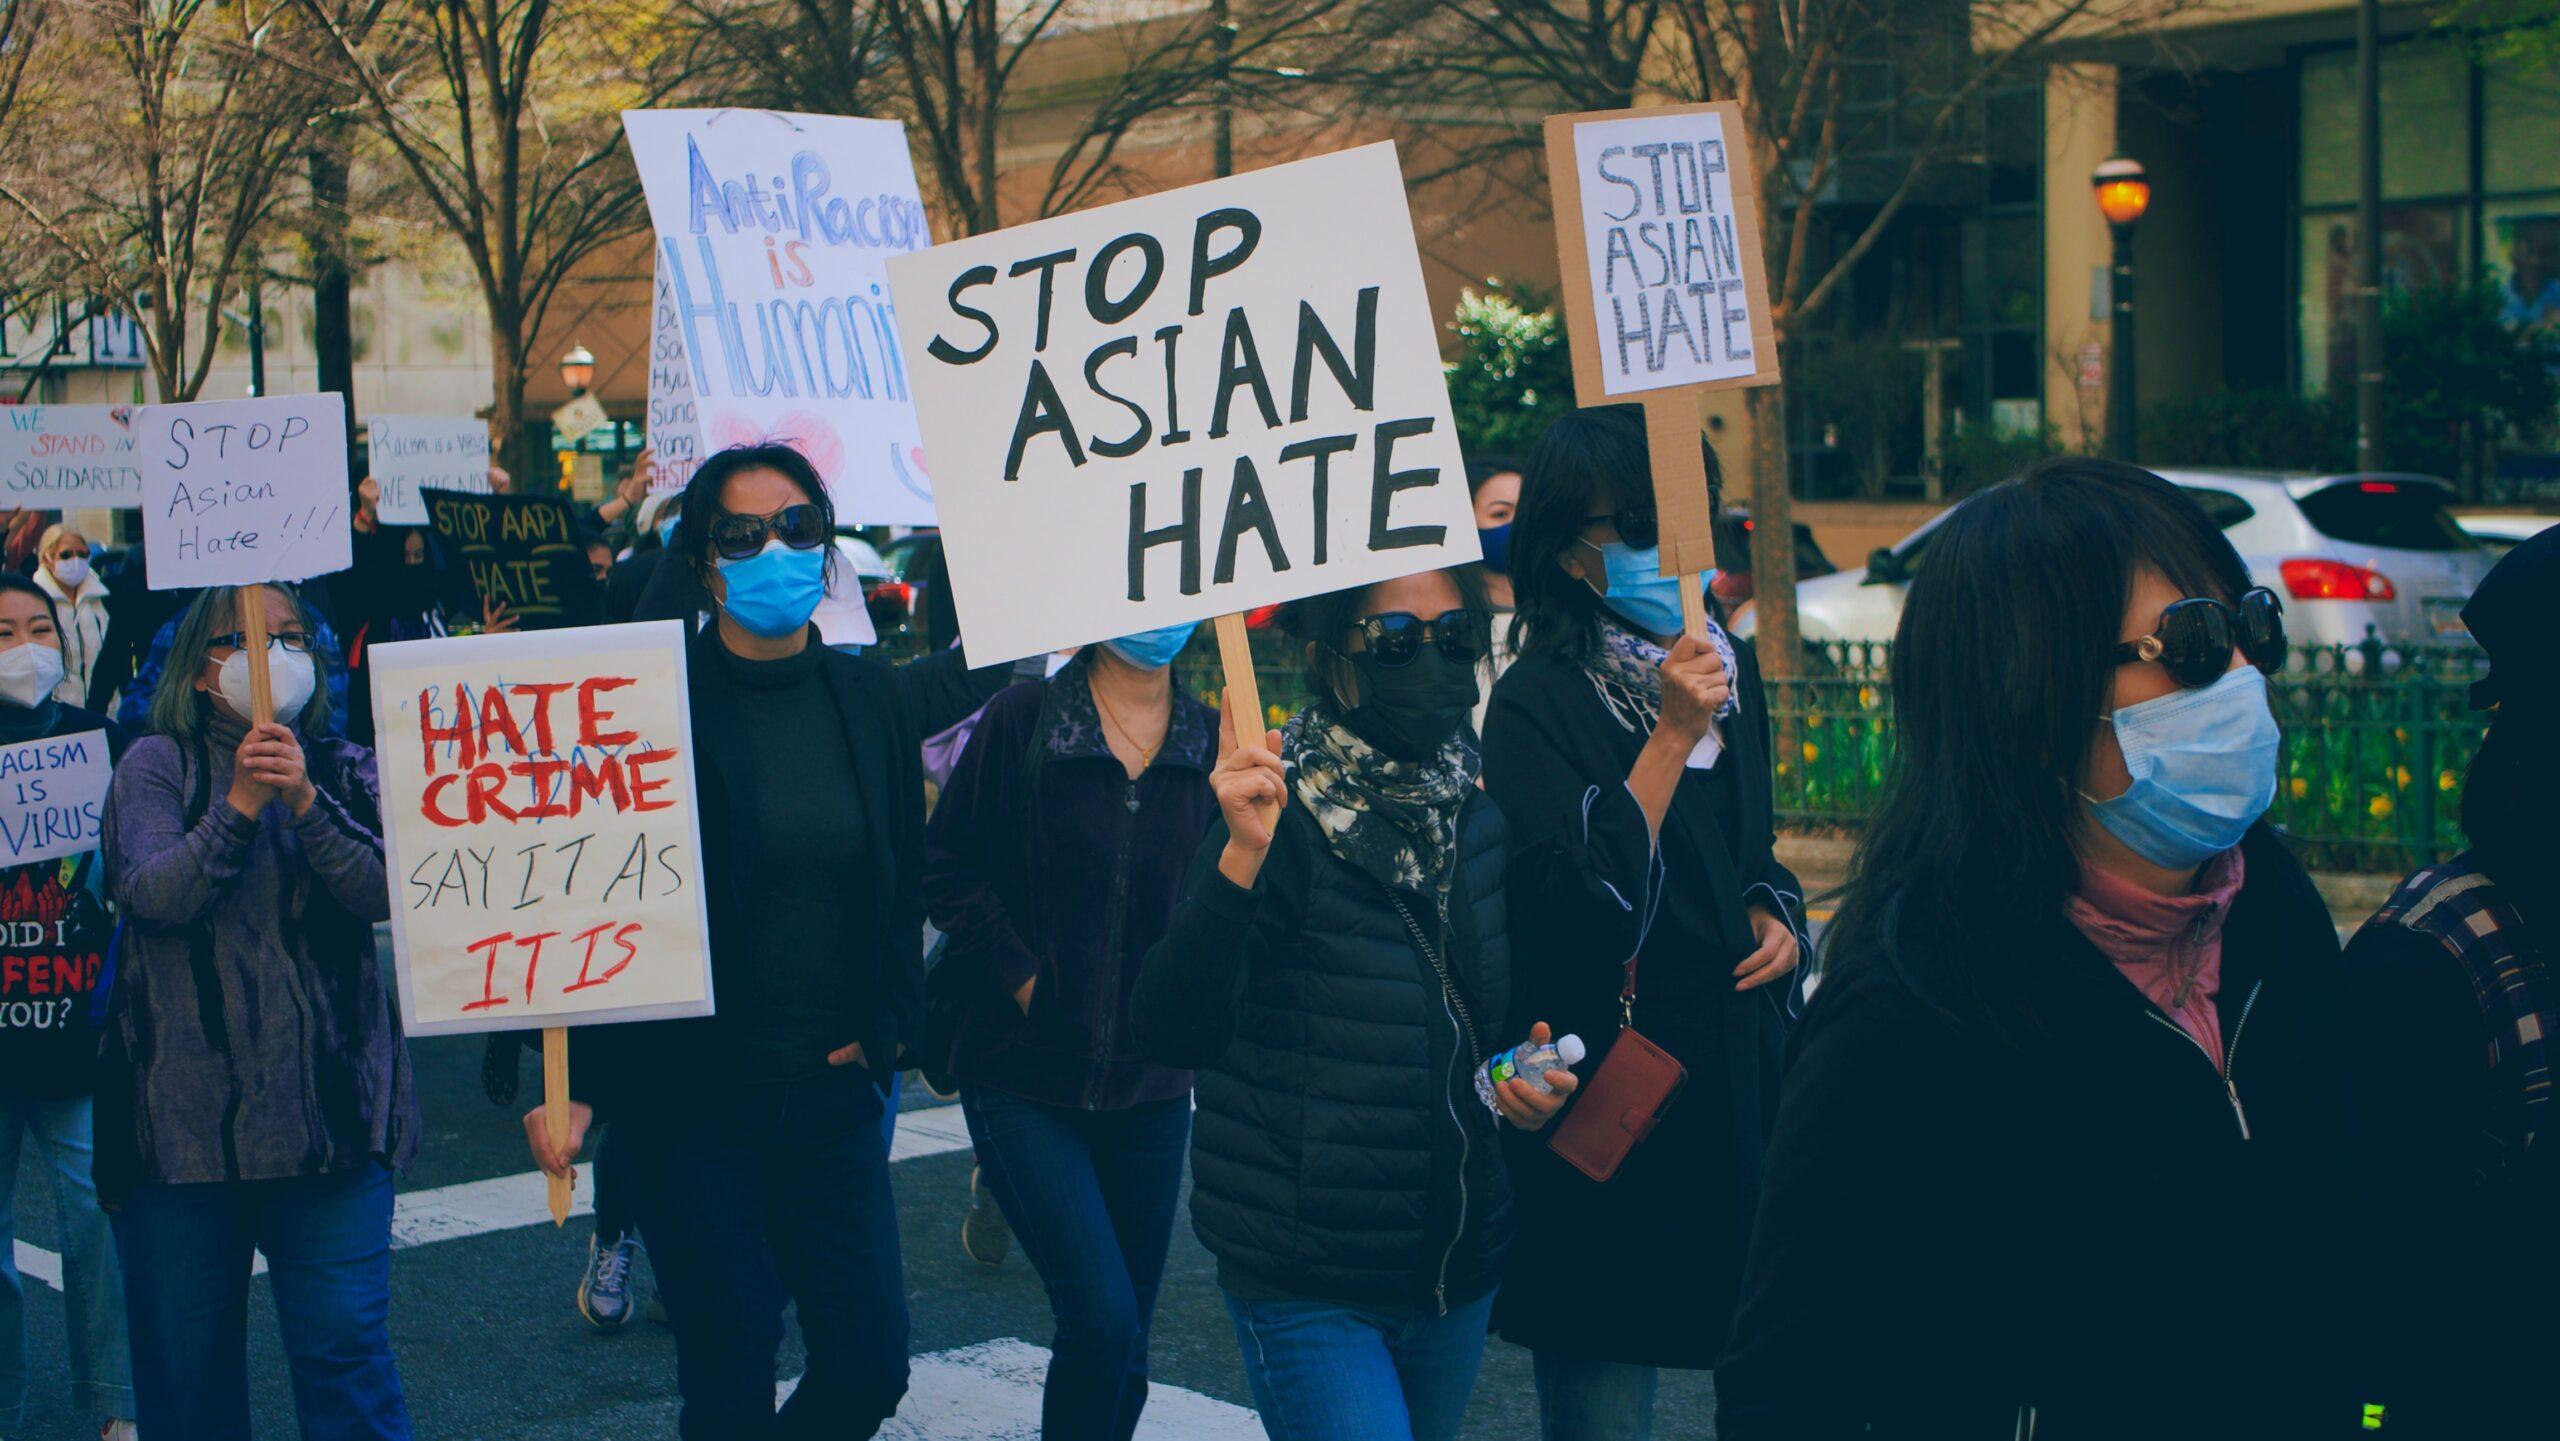 Anti-Asian Hat protest. Image Credit: Kareem Hayes on Unsplash